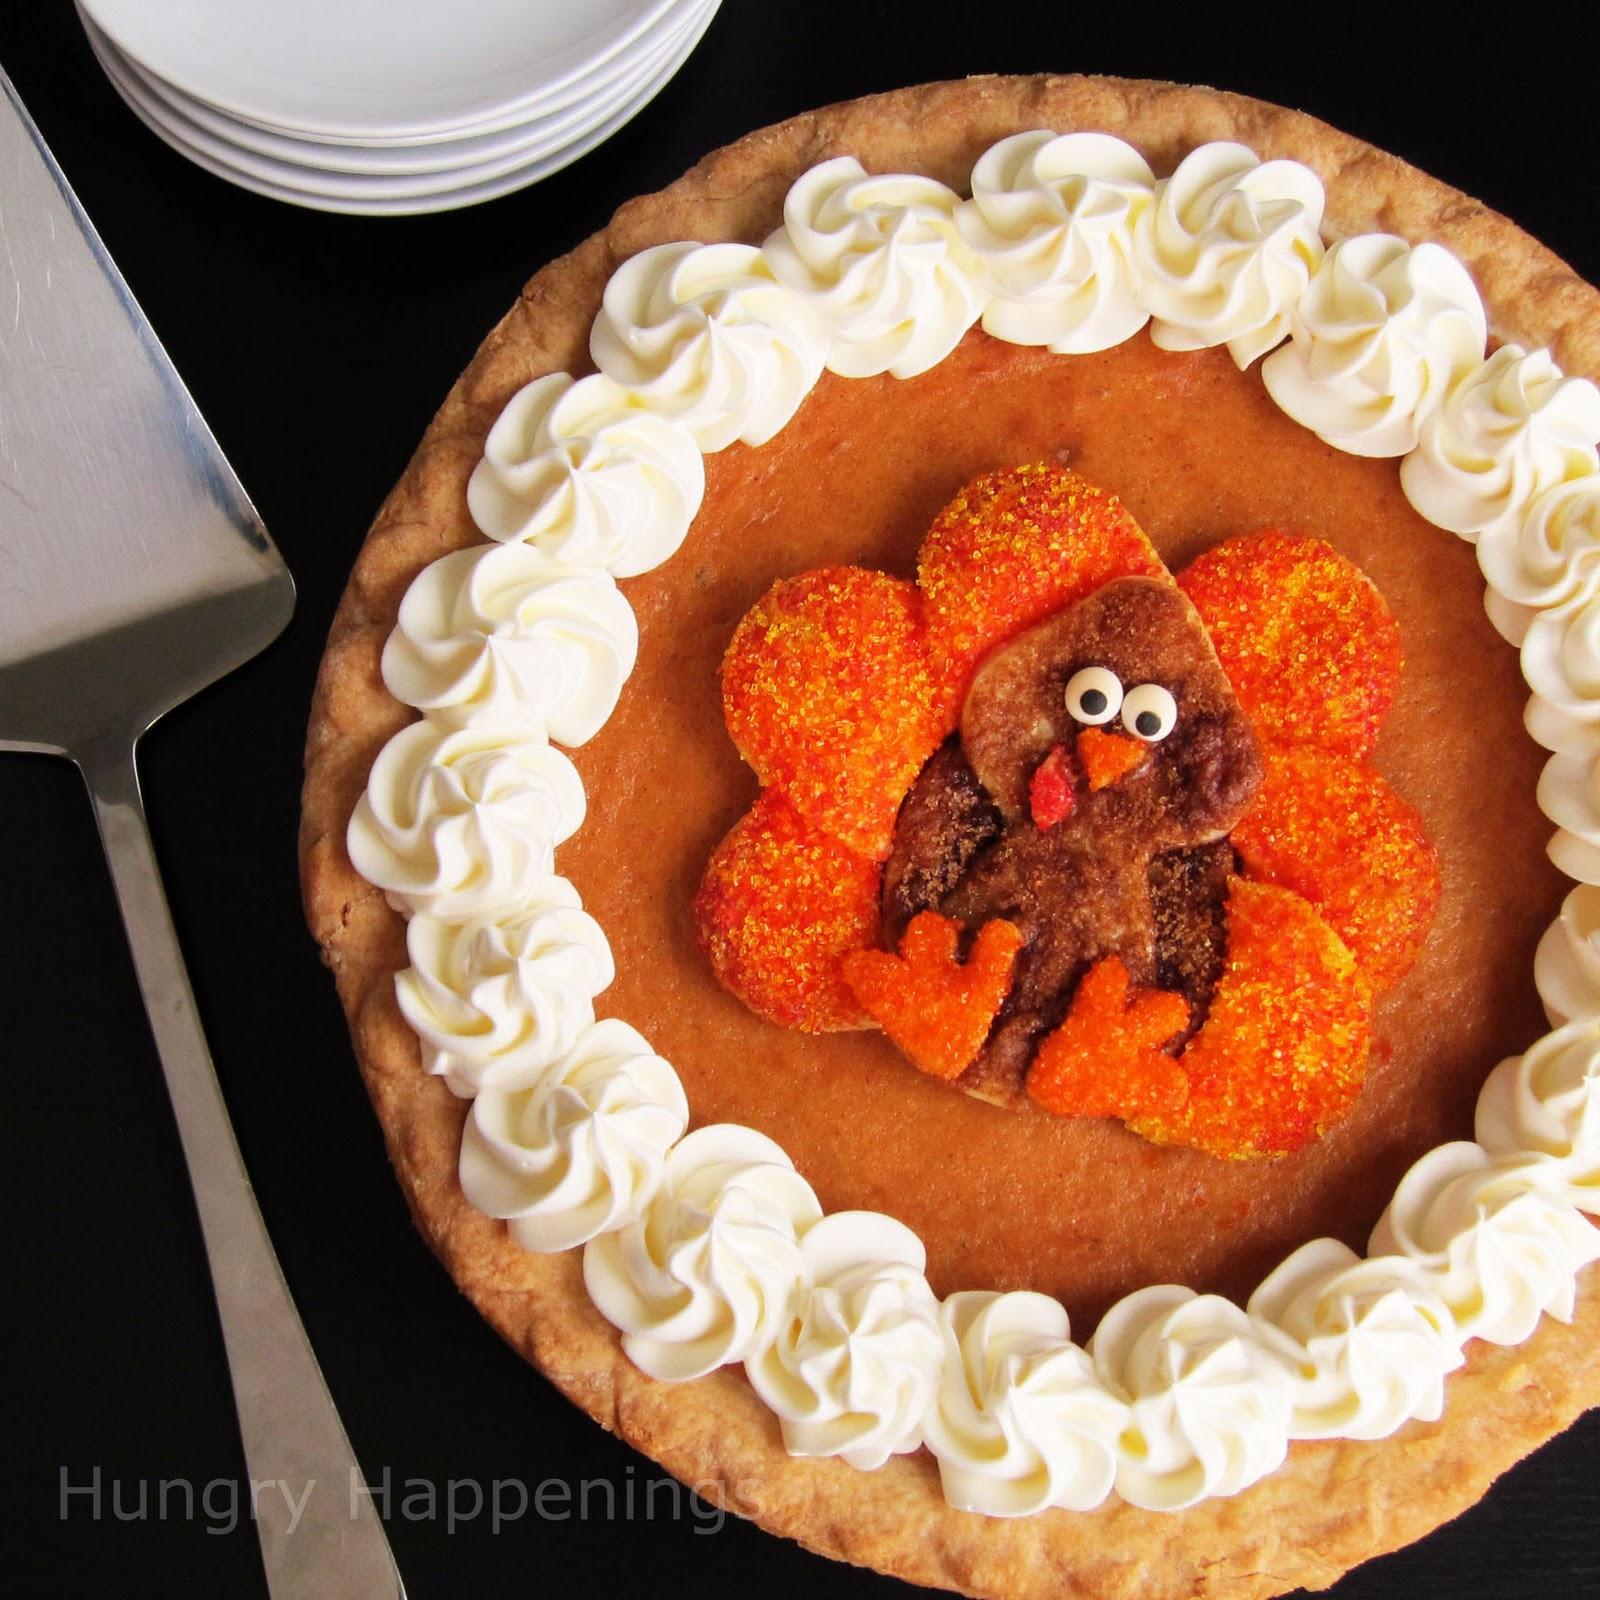 Pumpkin Pie Thanksgiving  Decorated Pumpkin Pie Festive Thanksgiving Dessert